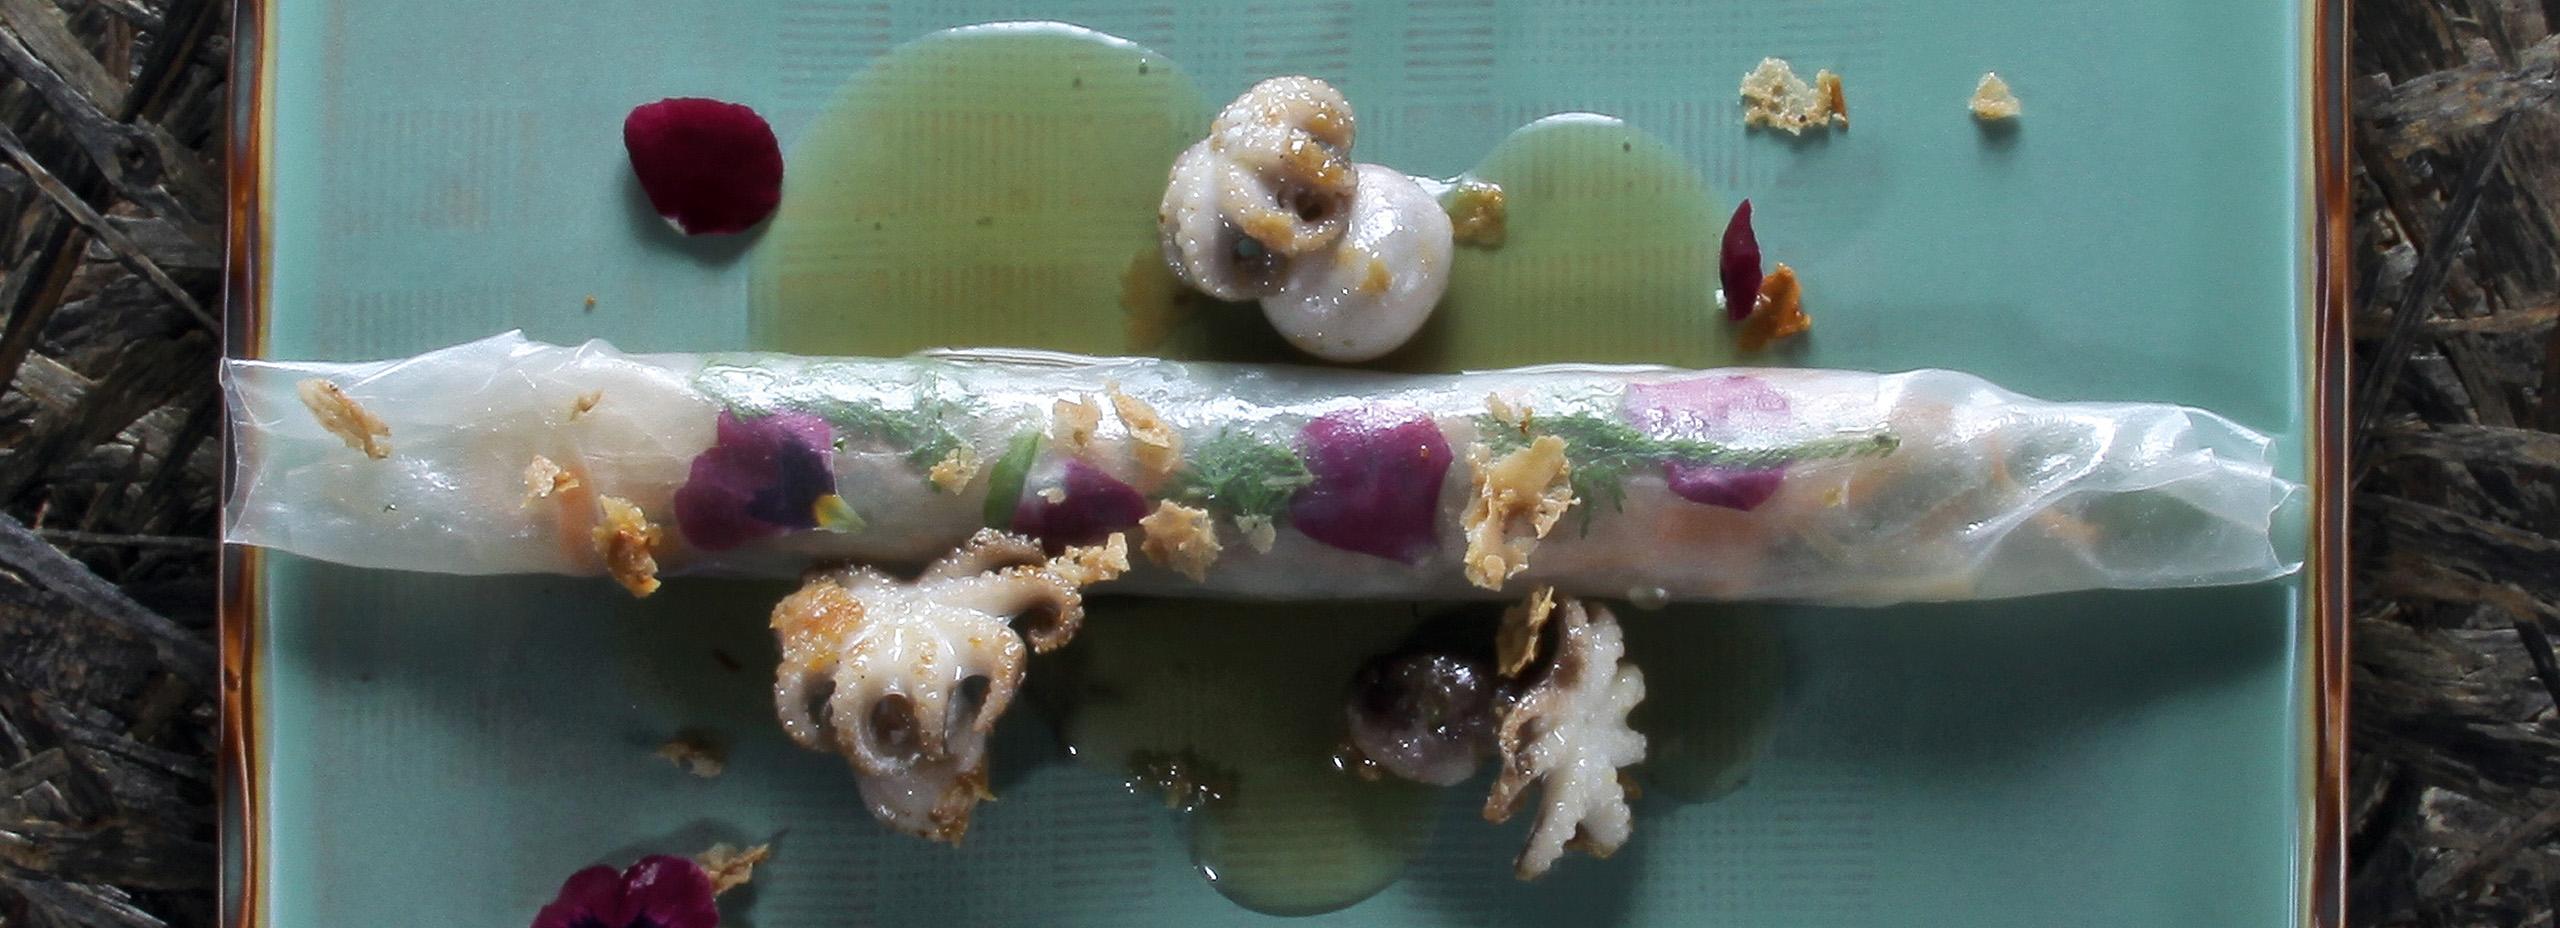 Gourmetessen Meeresfrüchte